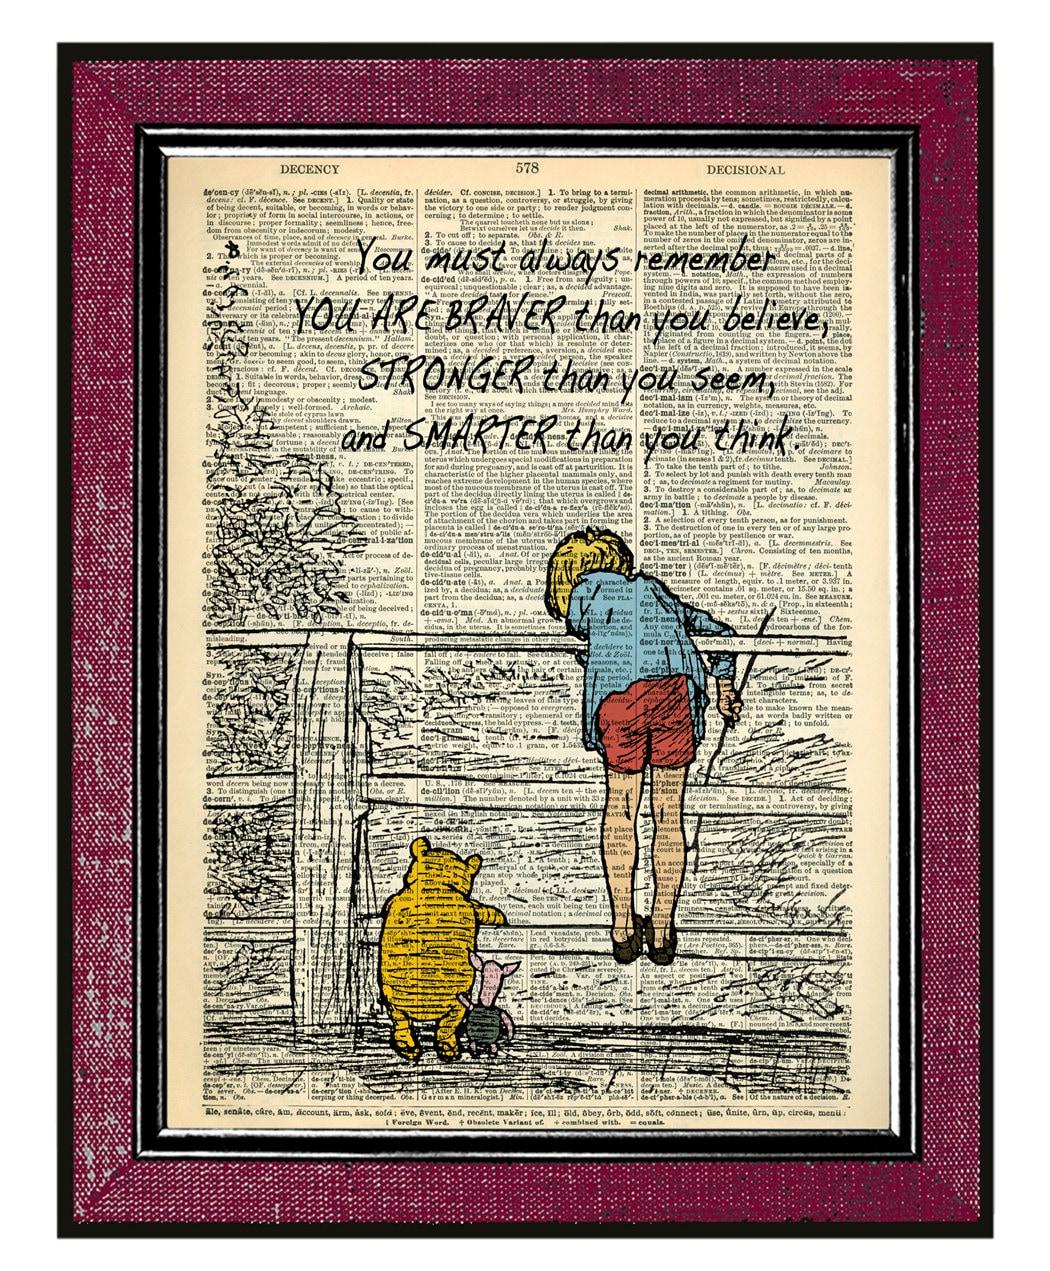 Winnie The Pooh Quote Art: WINNIE The POOH Quote Winnie The Pooh Birthday Book Art